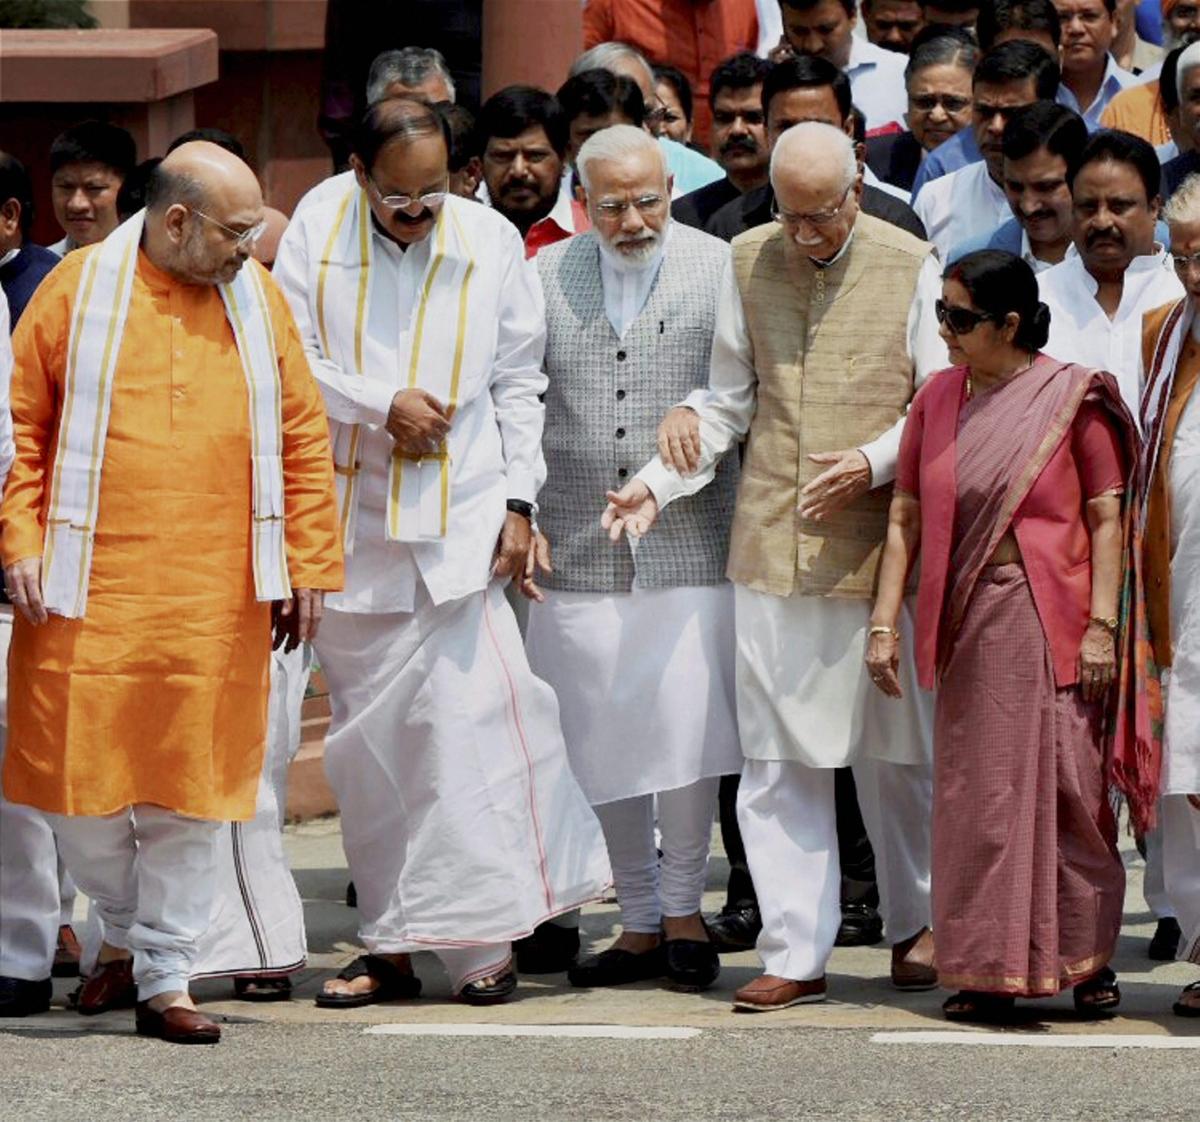 Sushma Swaraj was a 'sister' who used to tie rakhi to me every year: Venkaiah Naidu